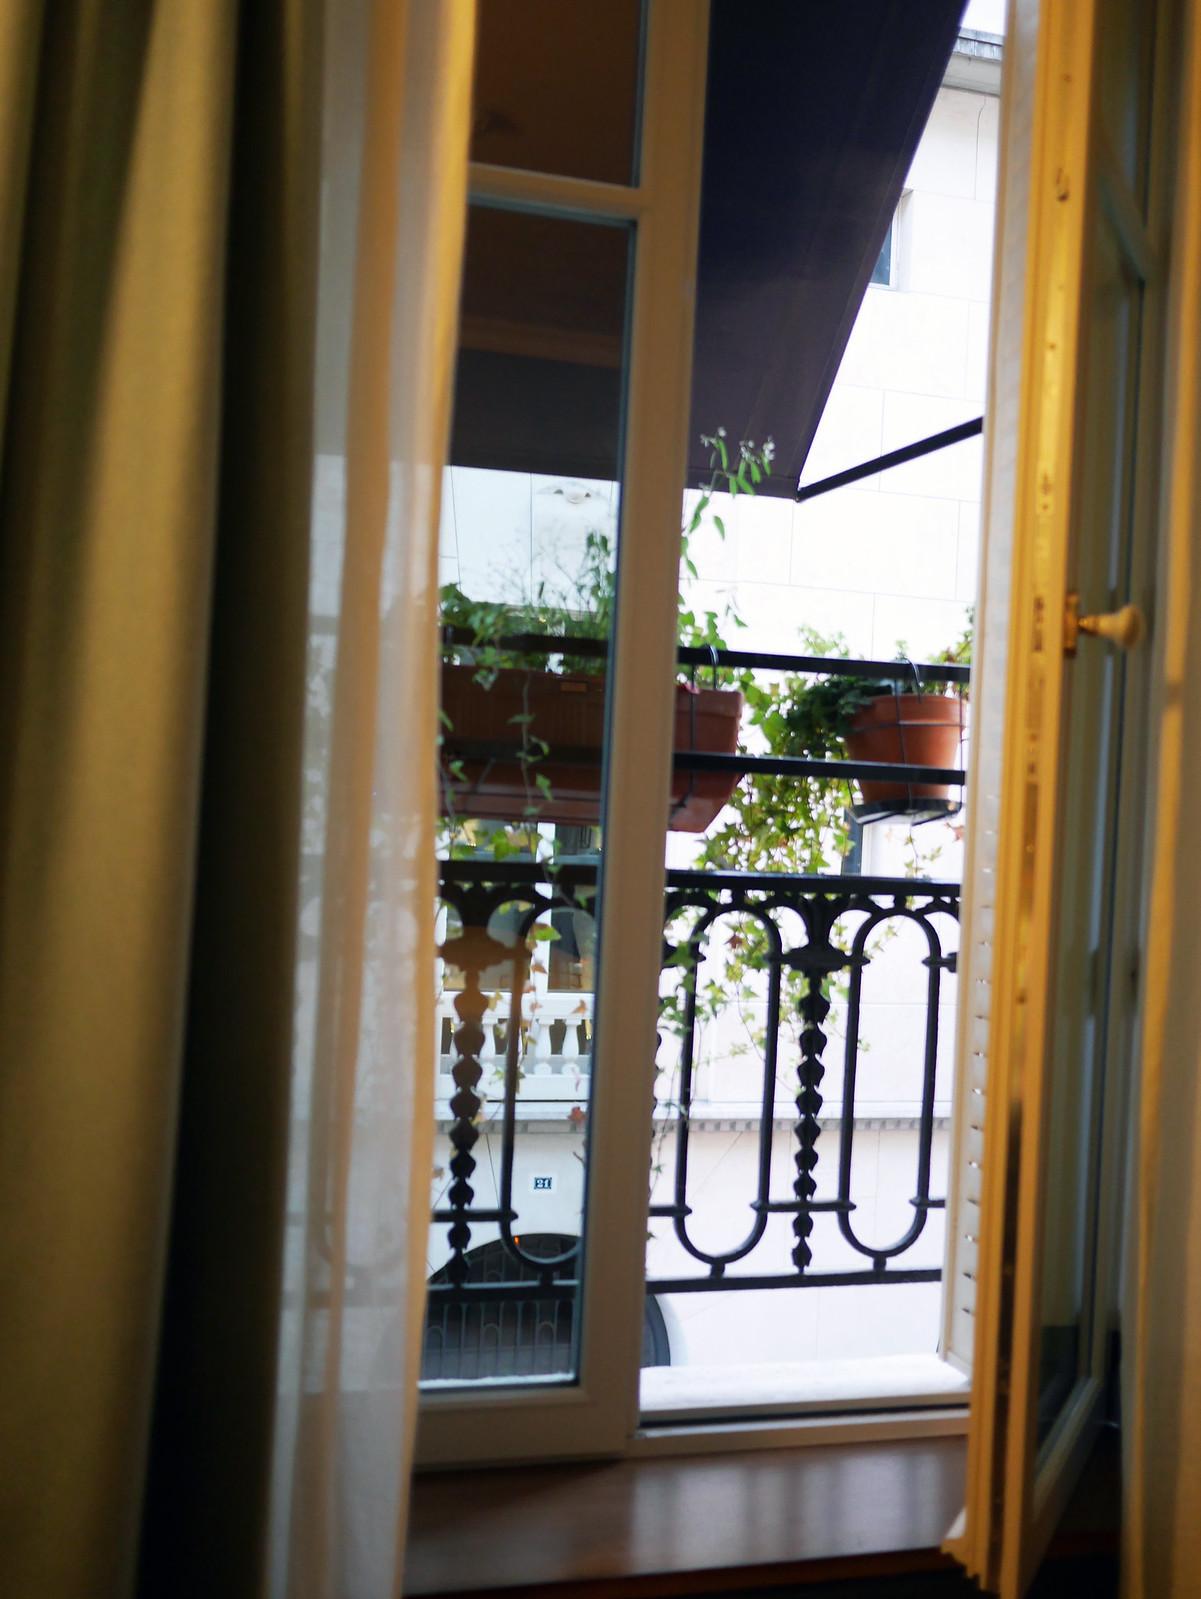 Hotel Bauchaumont Paris